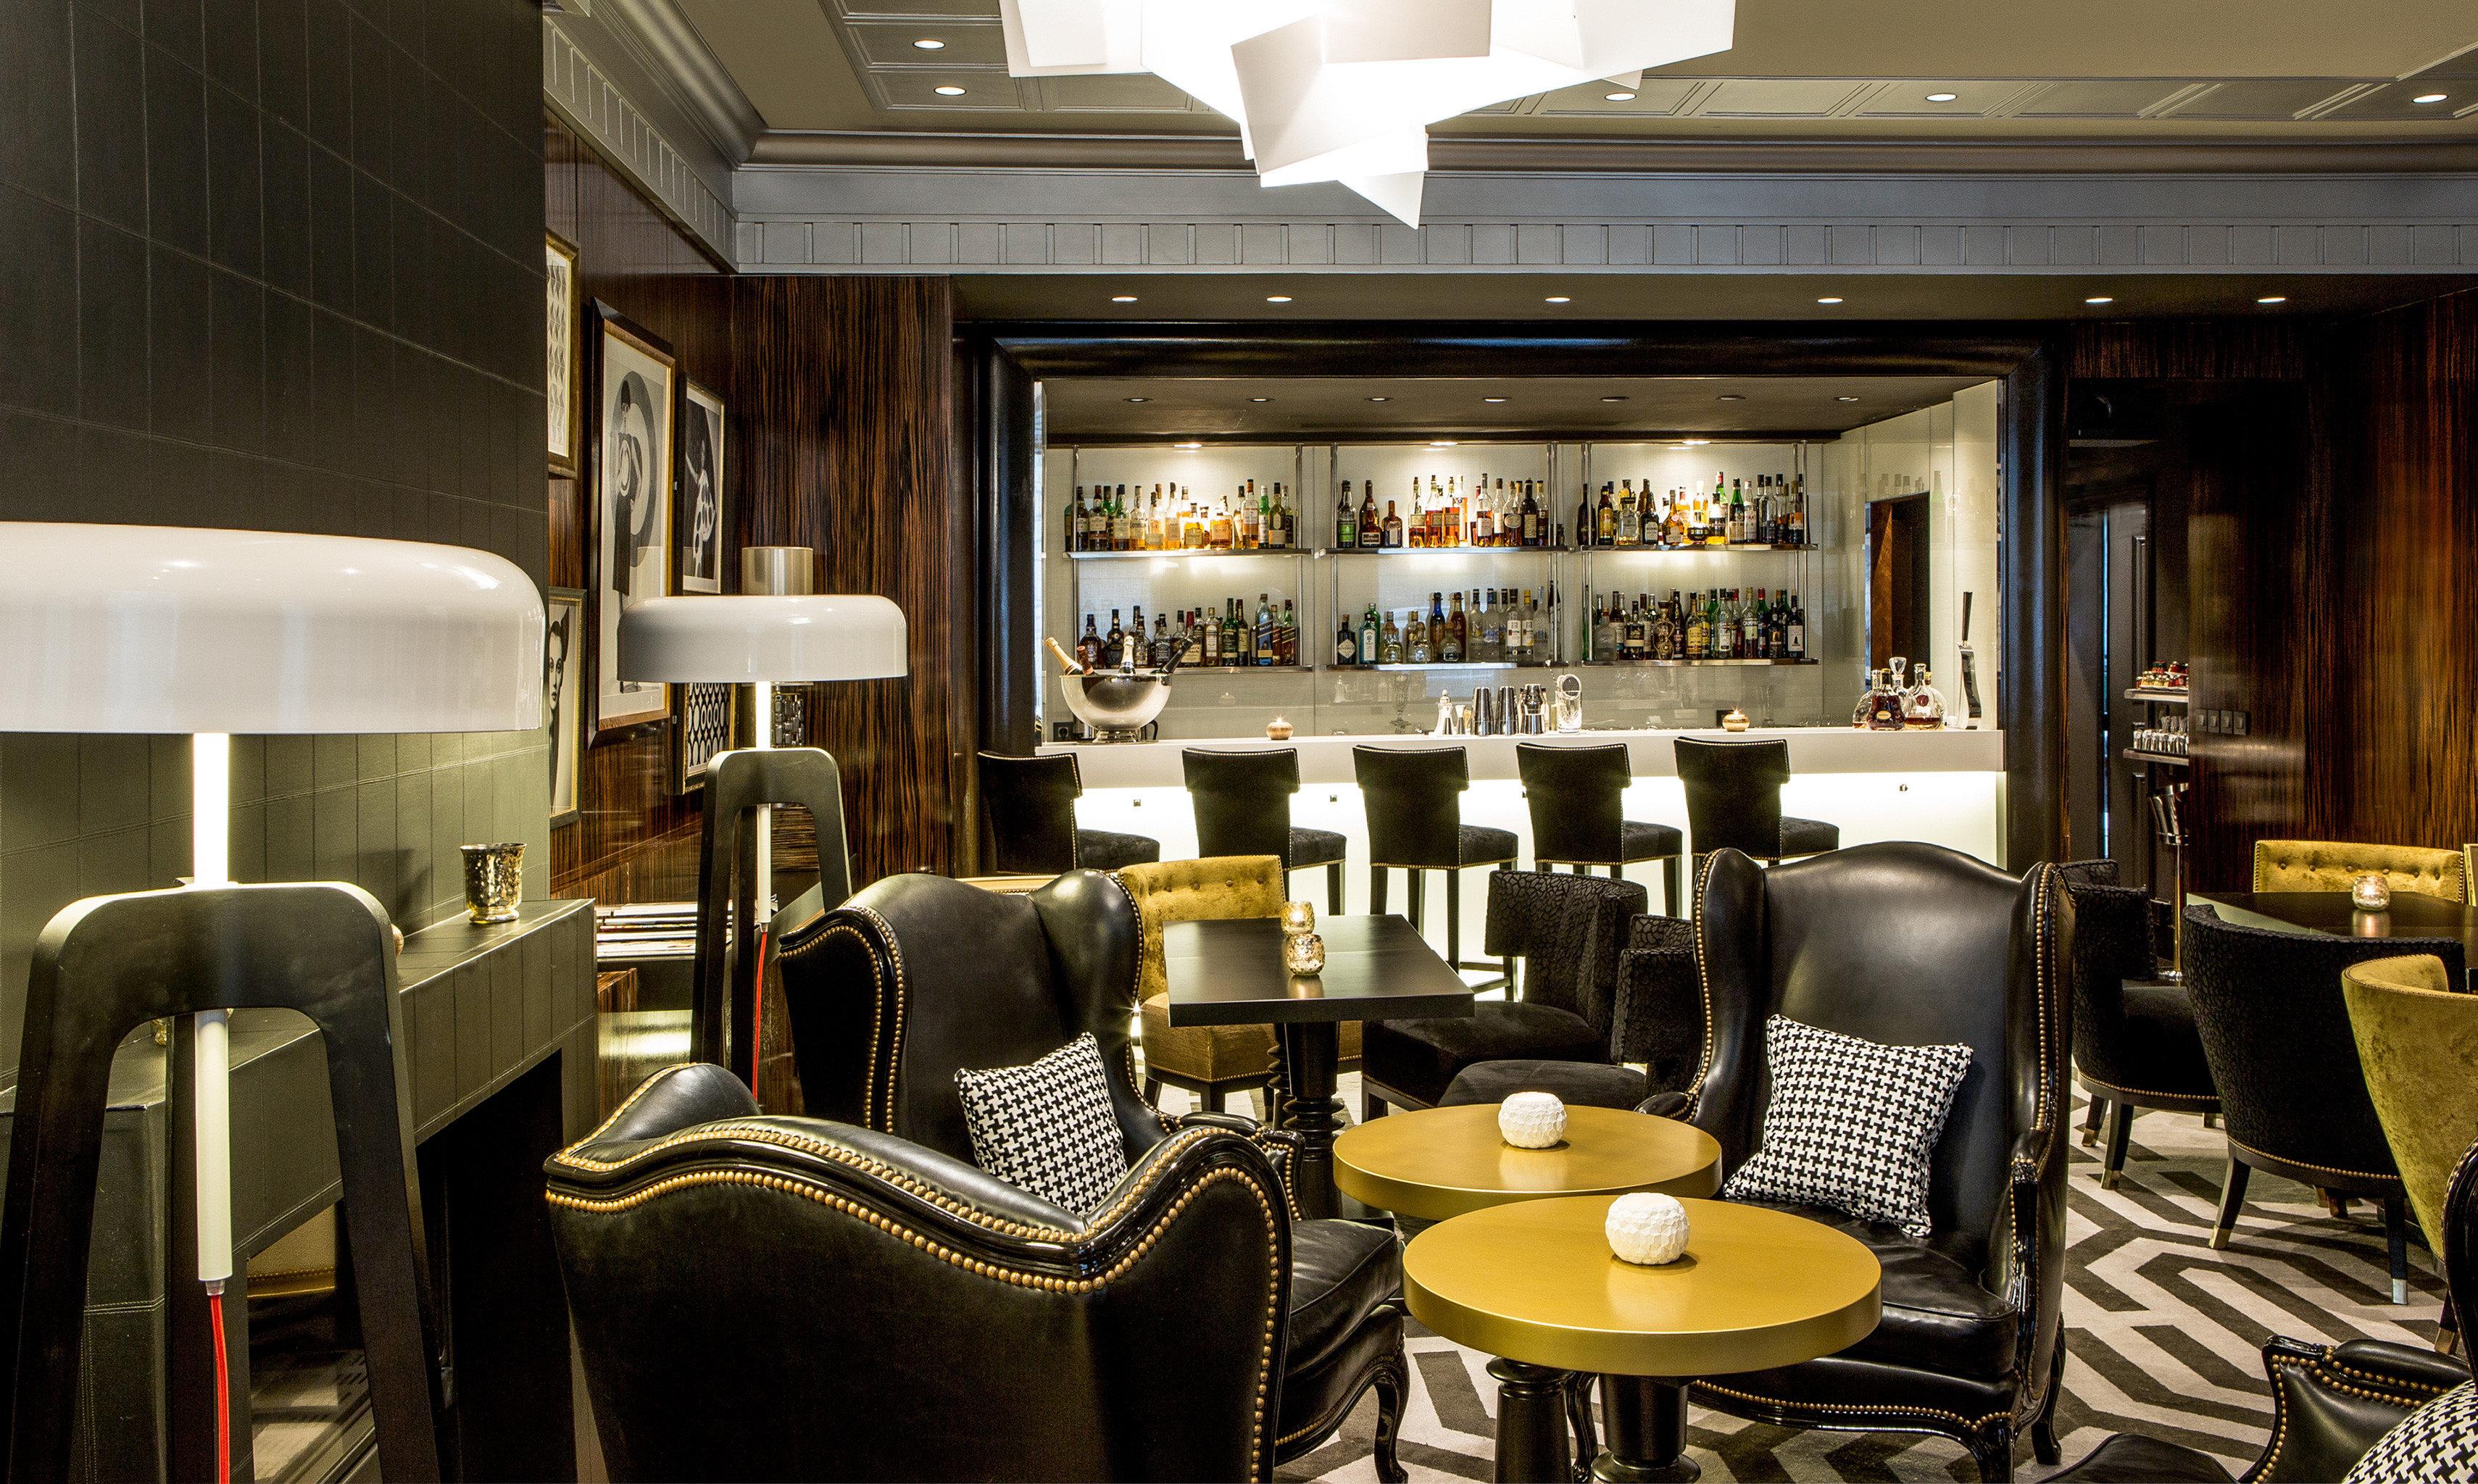 Bar Dining Drink Eat Elegant Lounge Luxury Modern chair restaurant Lobby café set cluttered